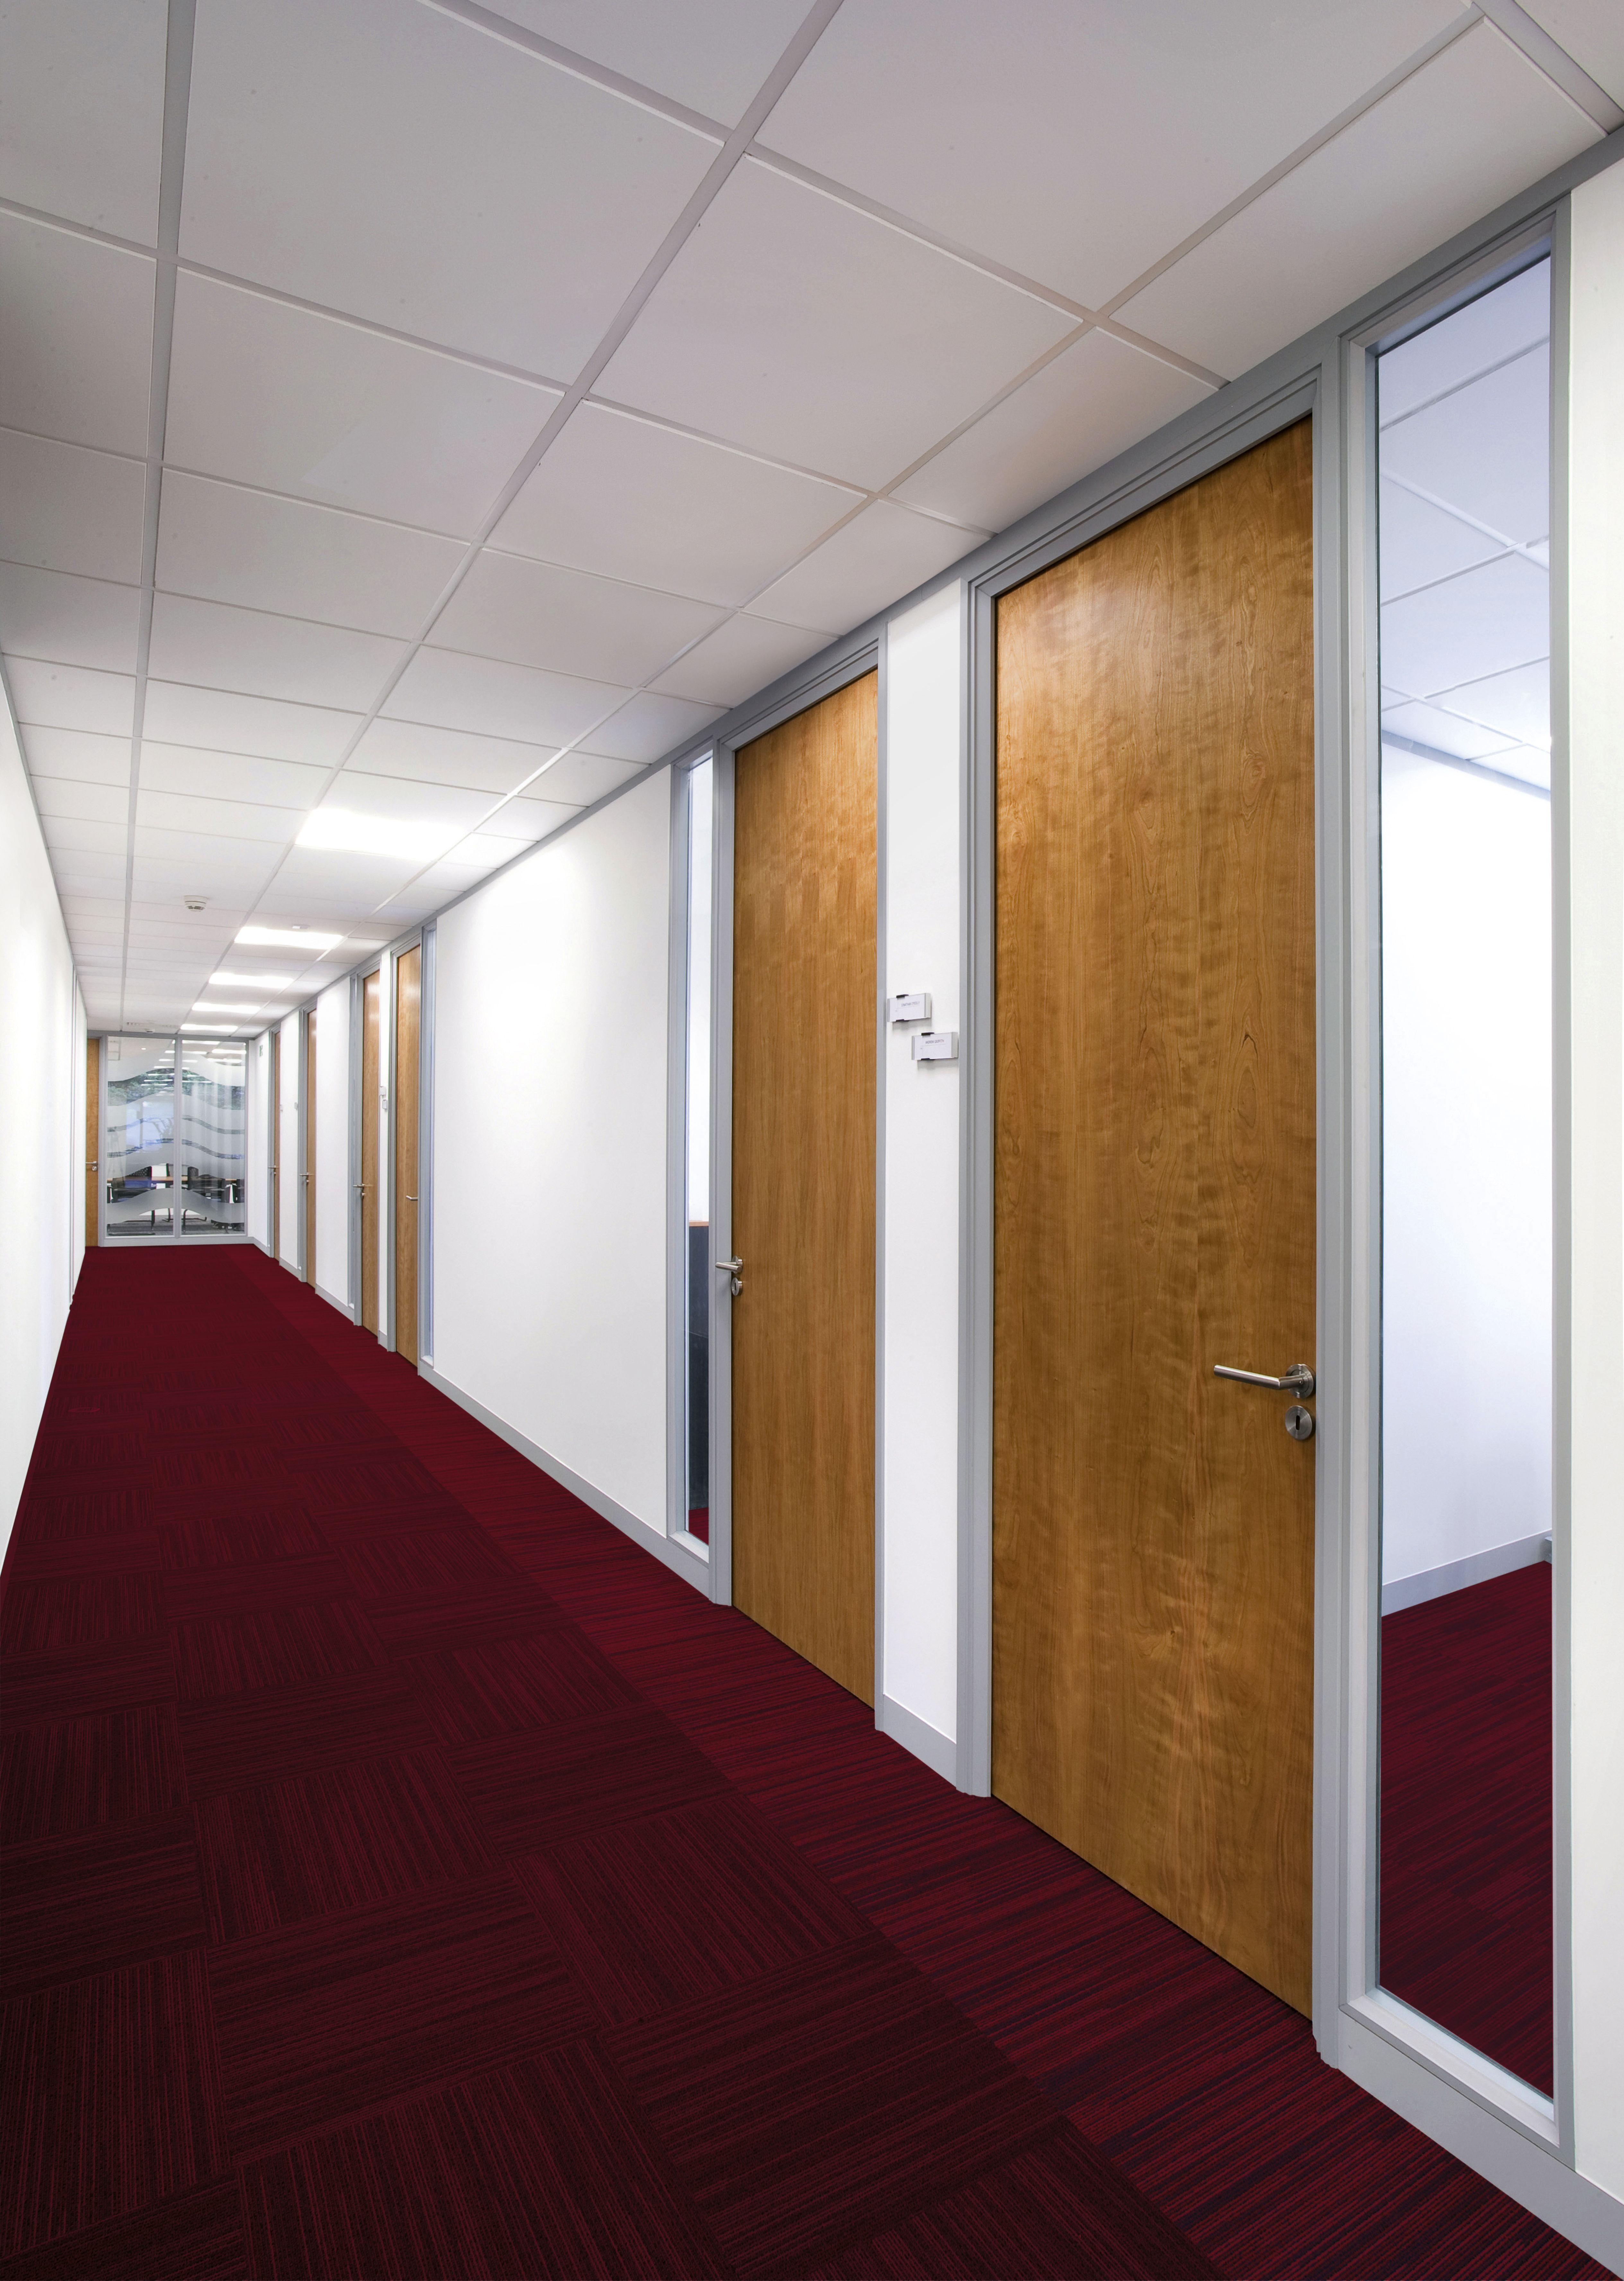 Internal Affairs Interior Designers: Pin By Corporate Interior Design On Office Refurbishment